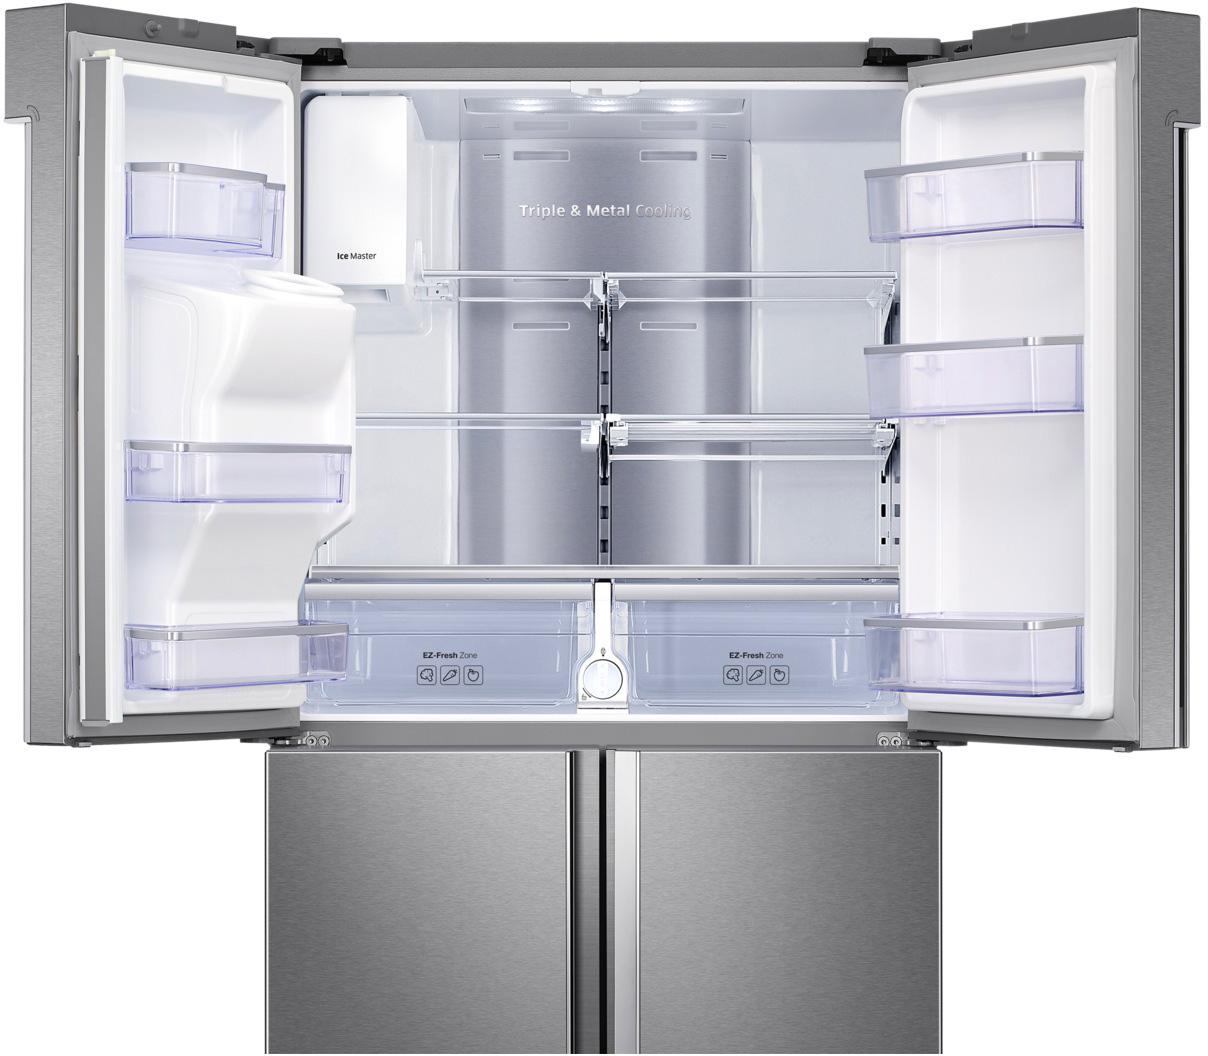 Frigorifero americano frigo side by side no frost samsung for Frigorifero side by side 4 porte